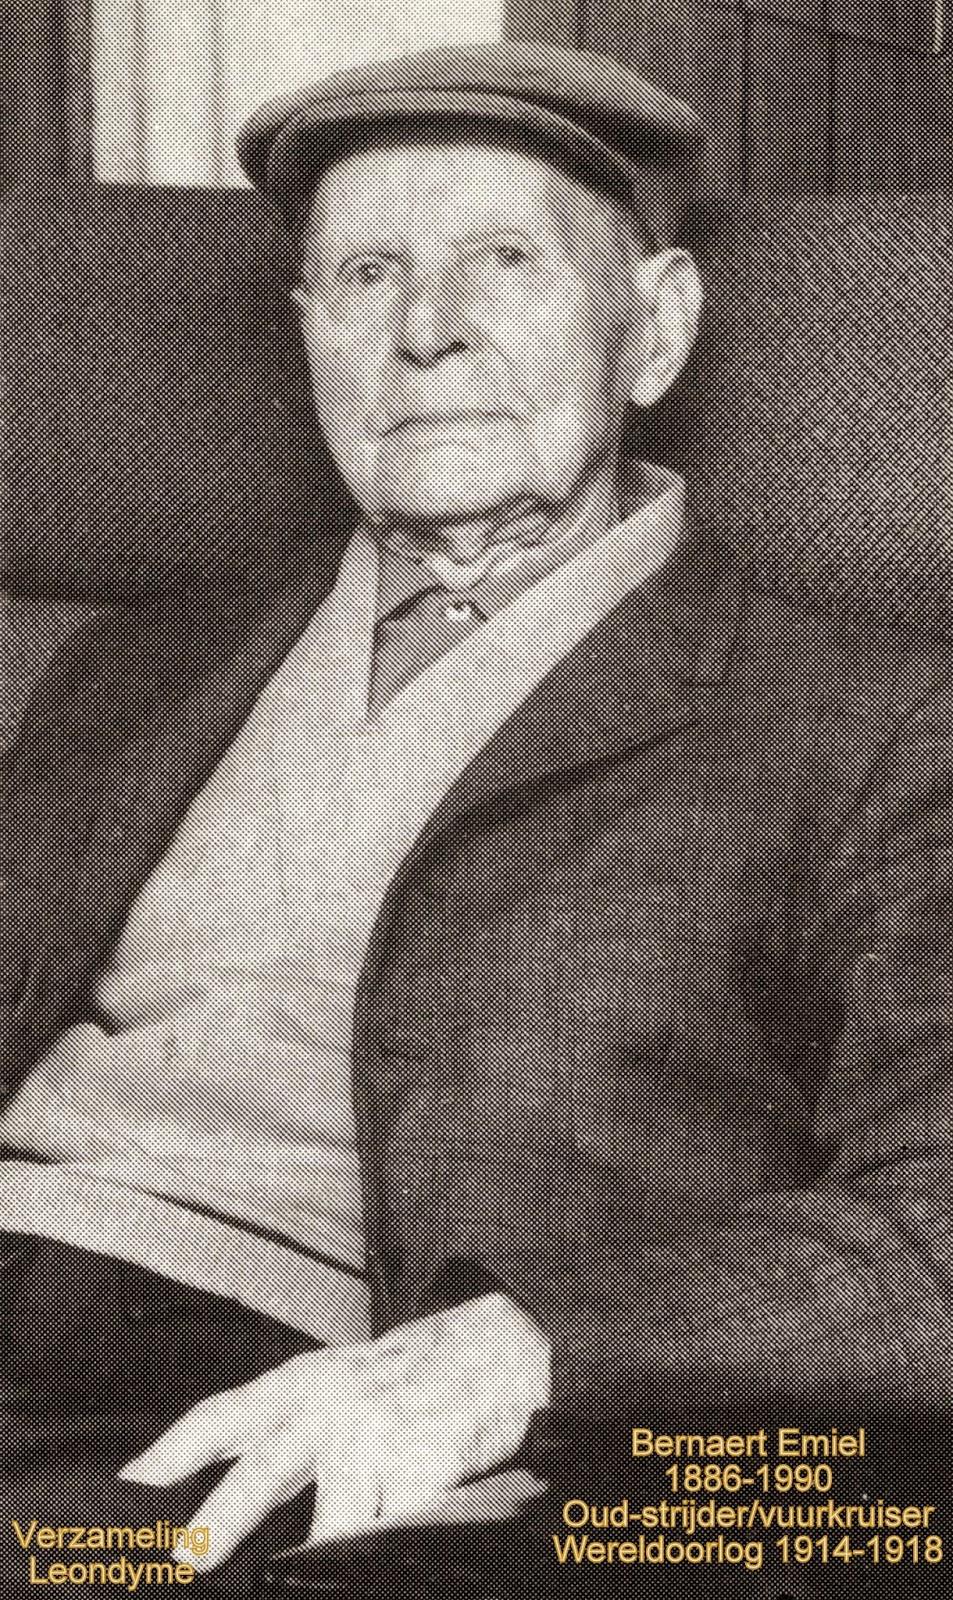 Emiel Bernaert 1886-1990. Foto bidprentje, verzameling Leondyme